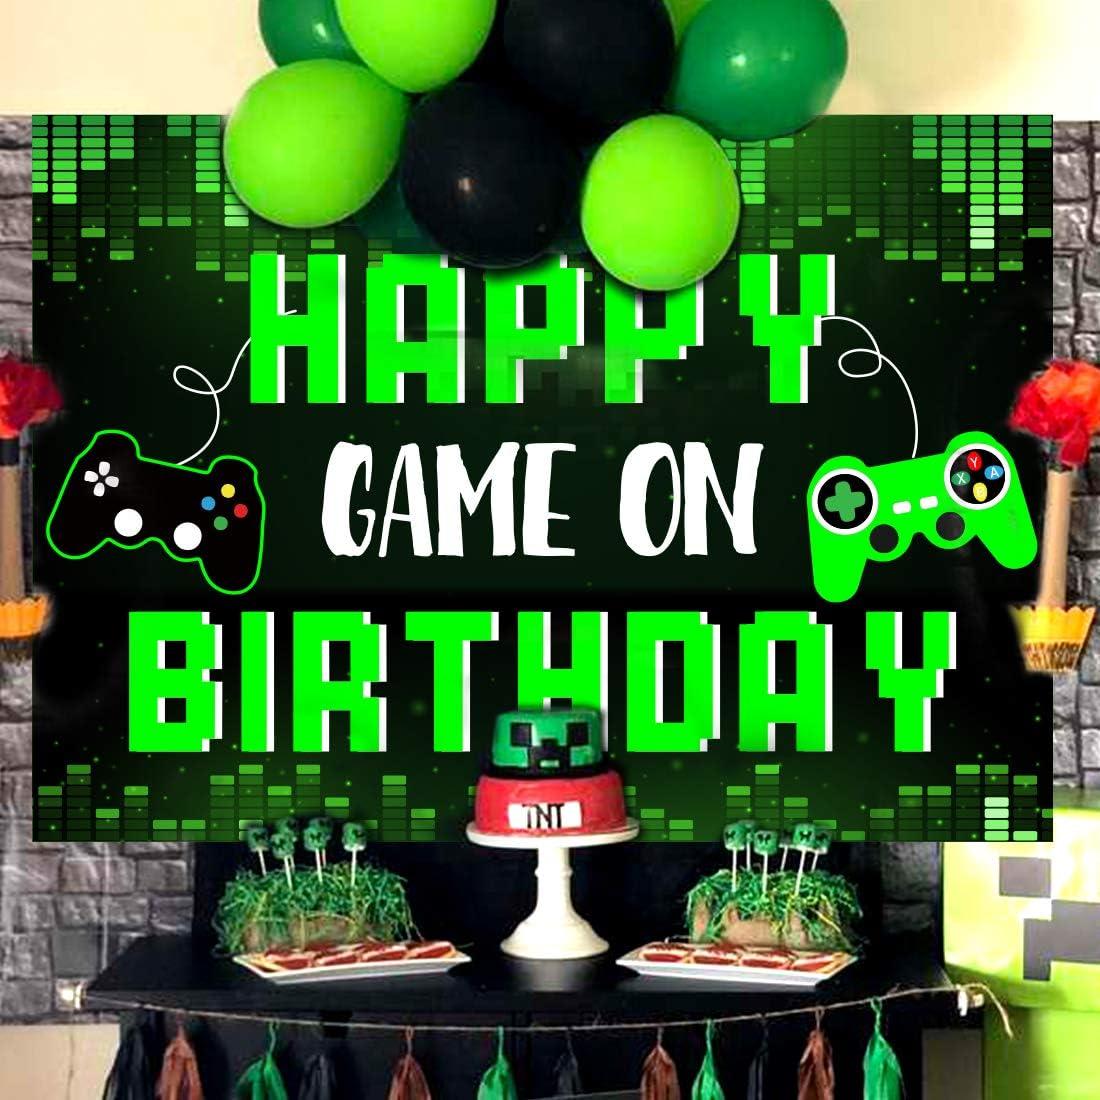 Fondo de cumplea/ños de Videojuegos para Boys Gaming Party Photo Background para Game on Birthday Party Supplies